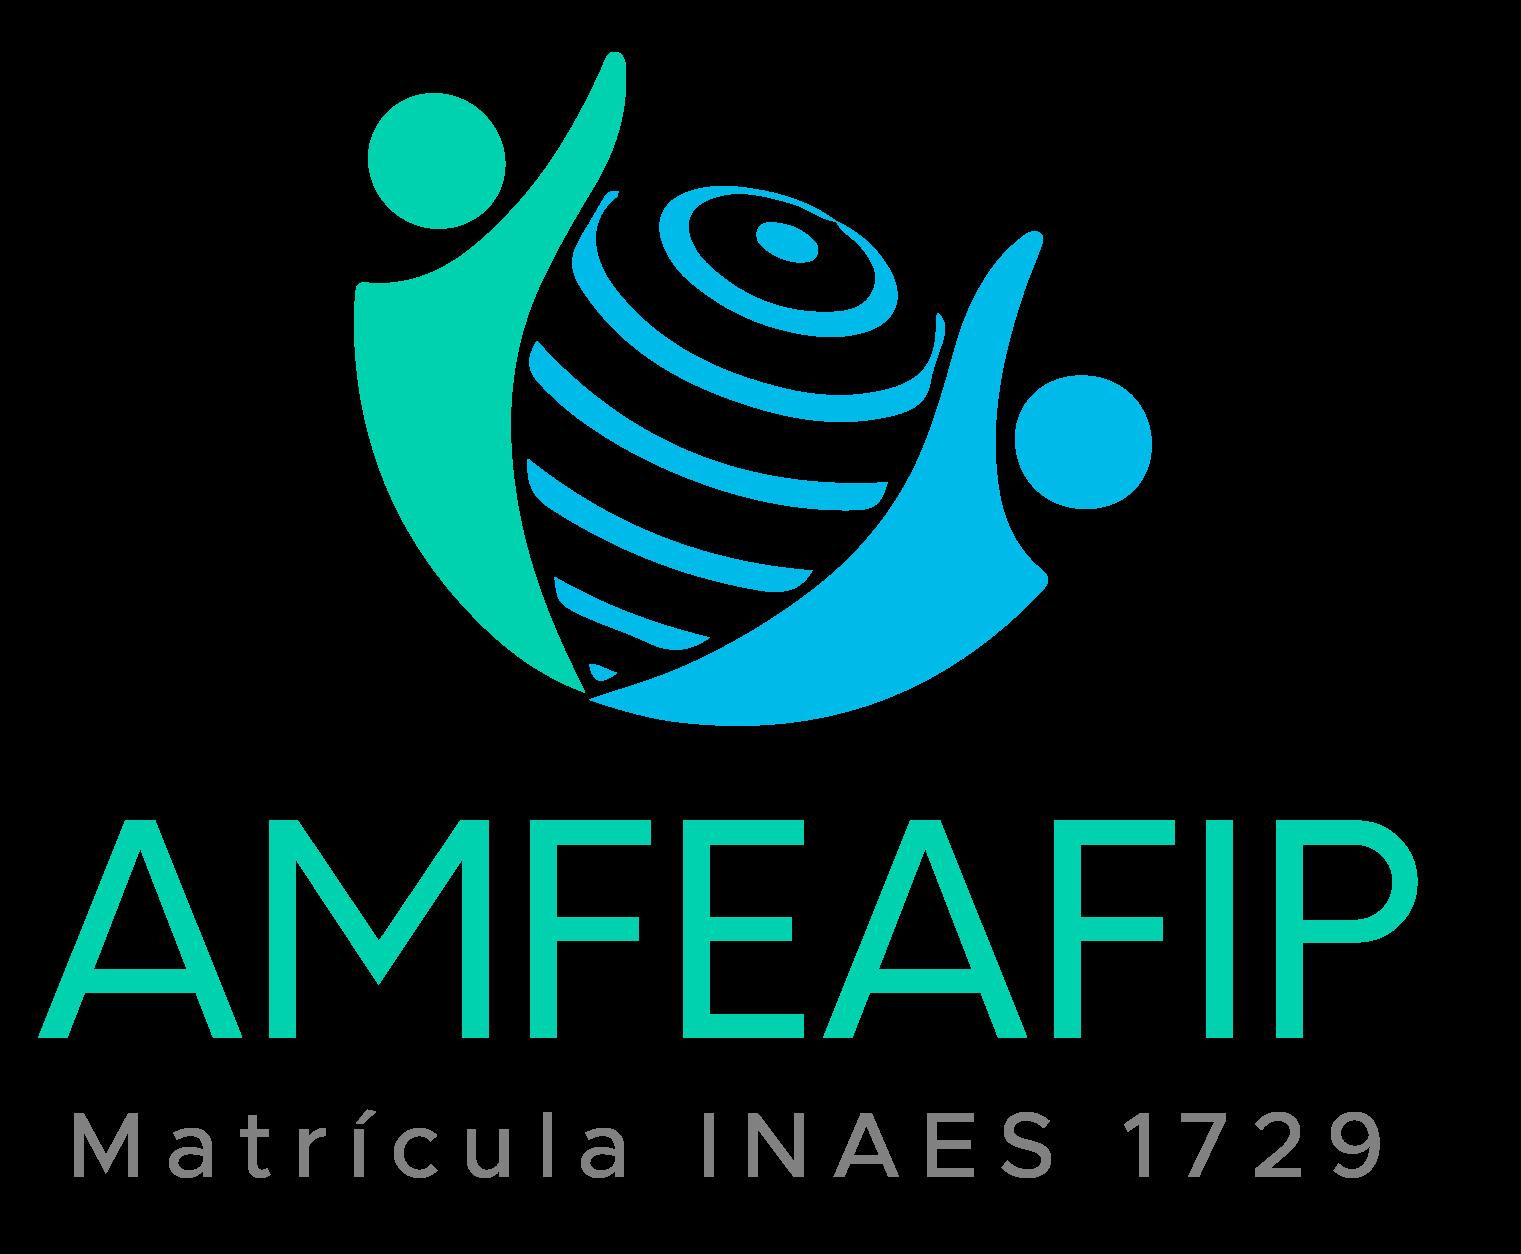 AMFEAFIP